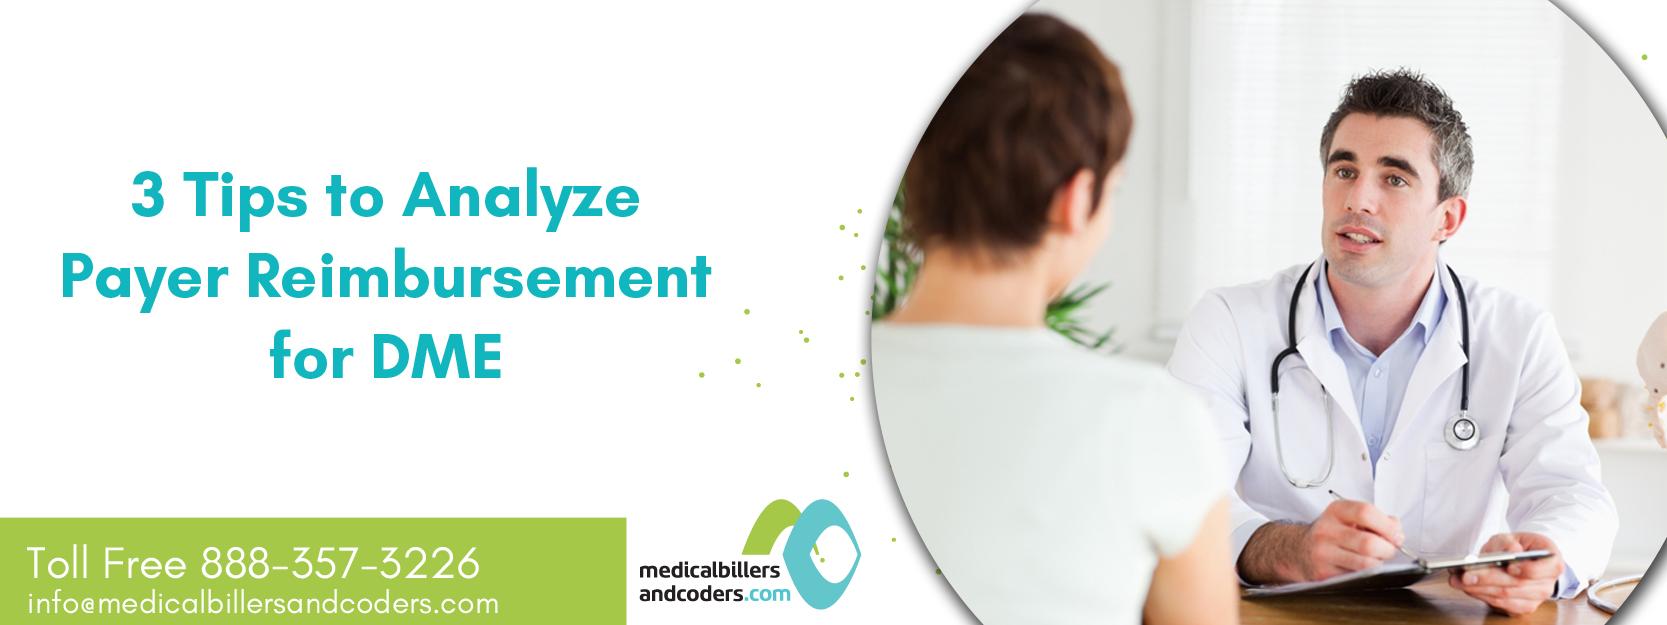 3 Tips to Analyze Payer Reimbursement for DME